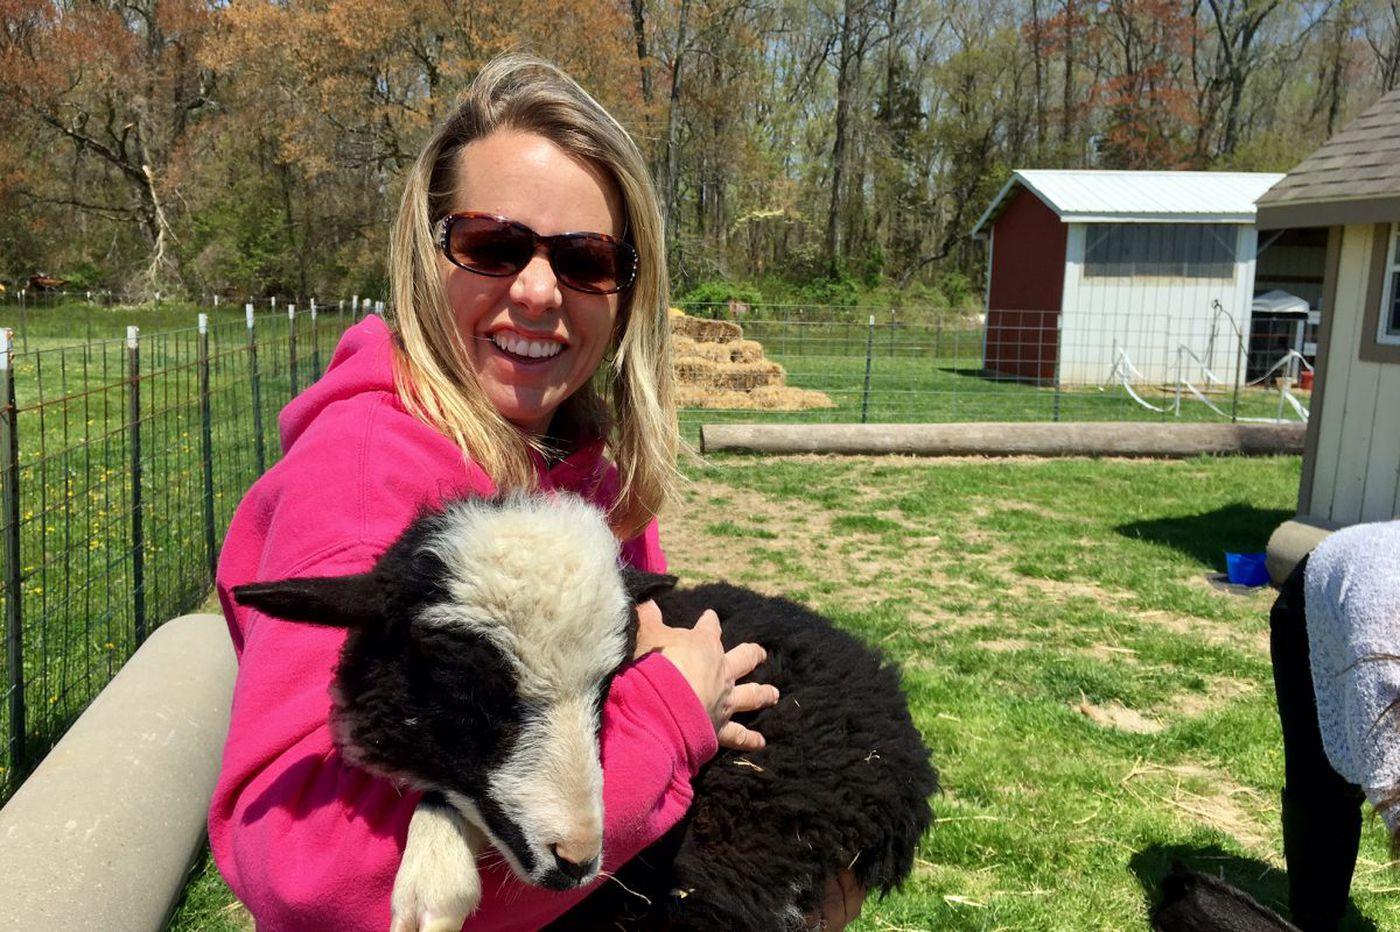 Farmyards, vineyards, byways, and waterways: Welcome to Salem County, N.J. | Kevin Riordan